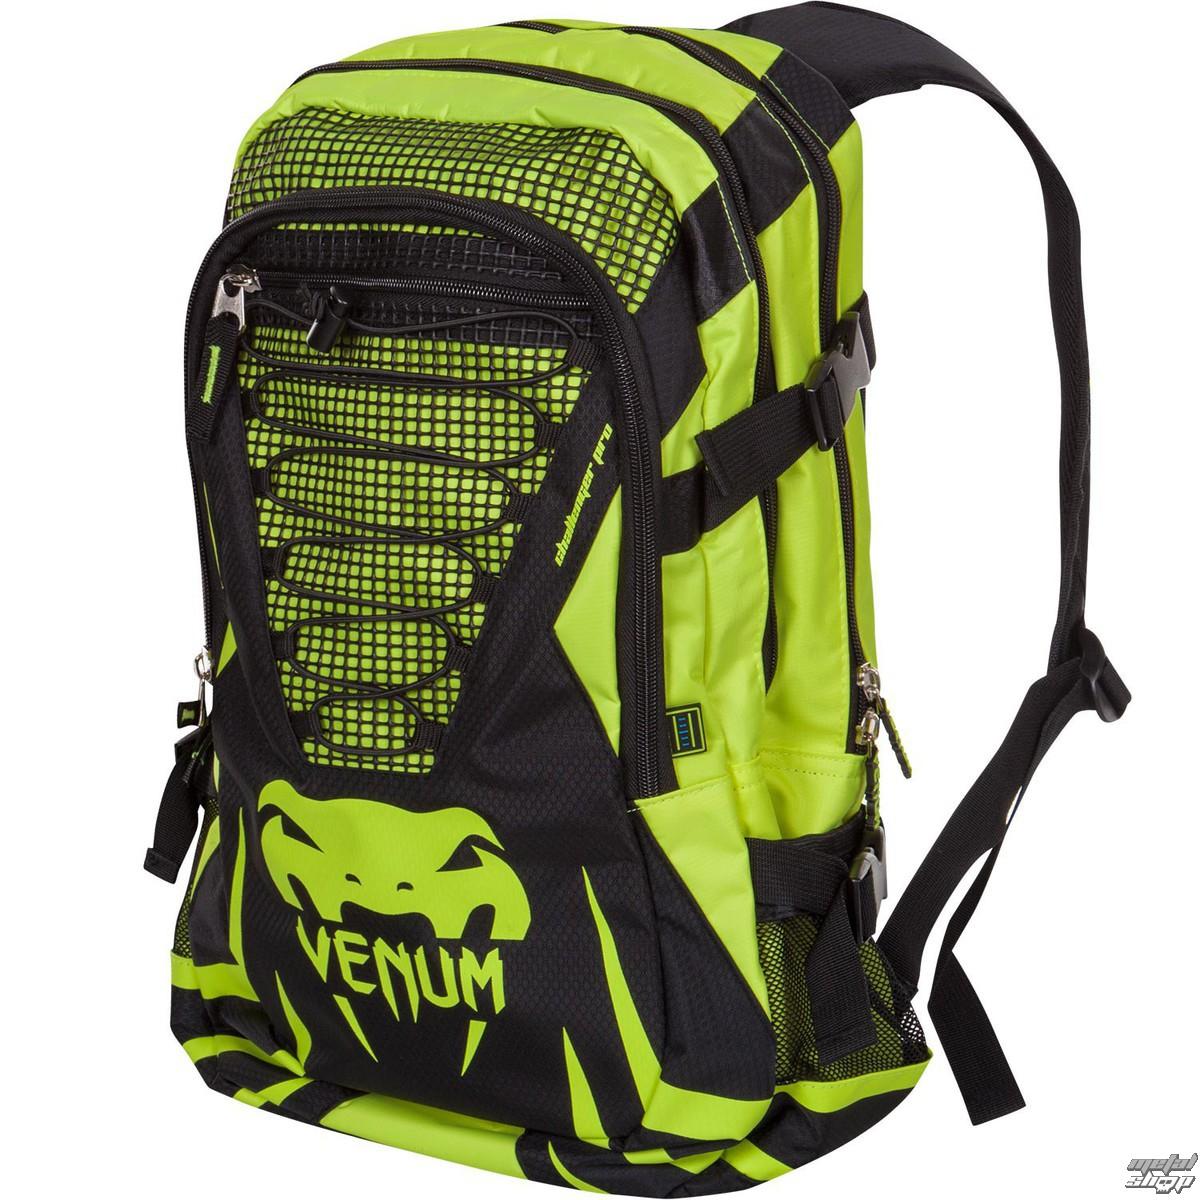 batoh VENUM - Challenger - Yellow Black - EU-VENUM-2122-YELLOW